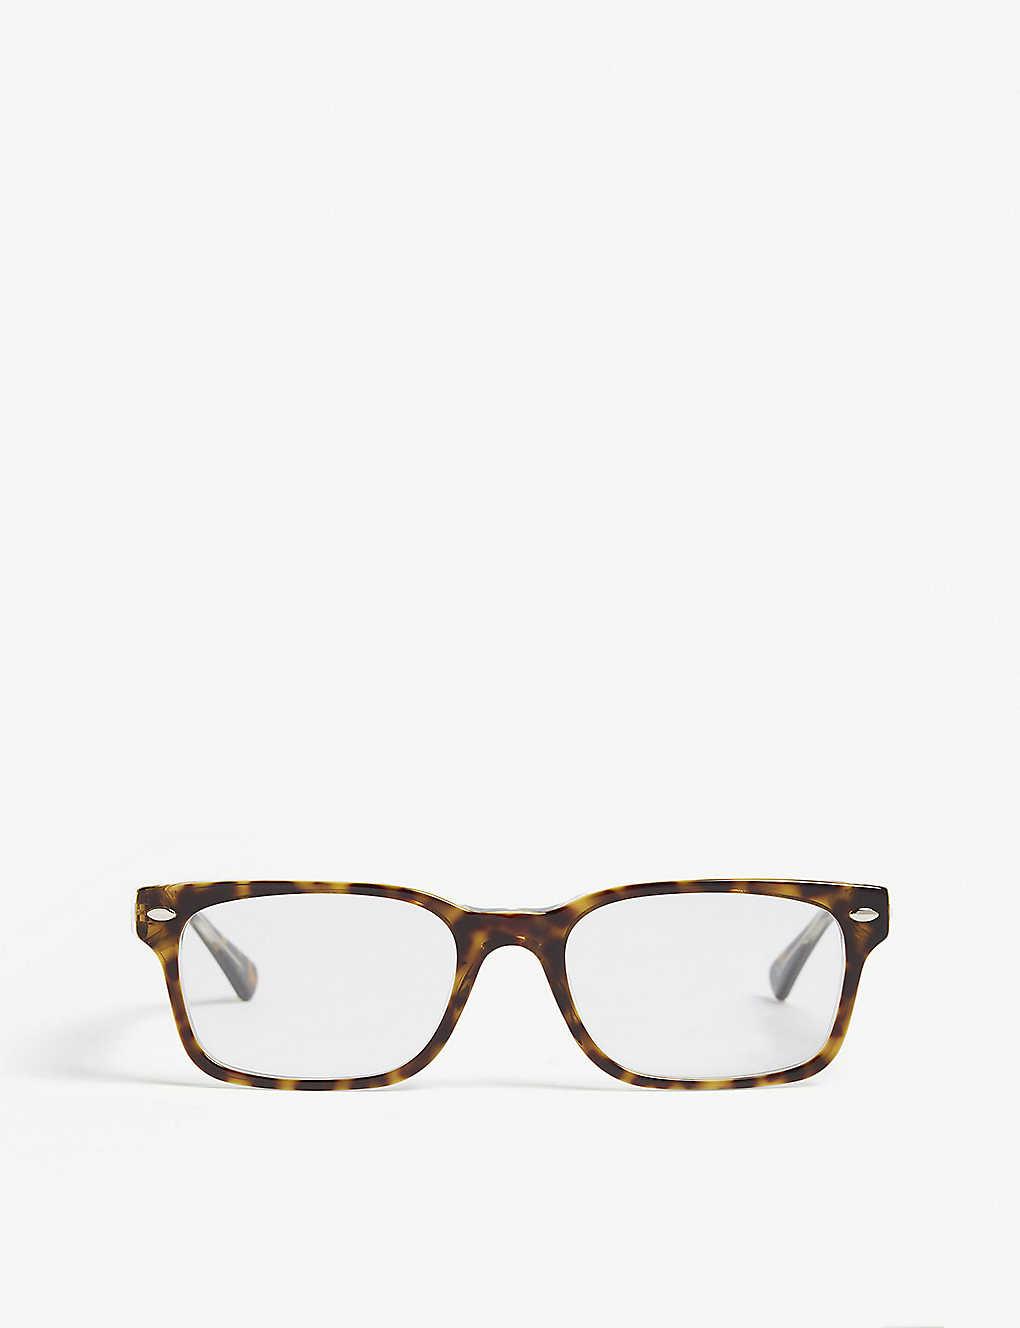 7dab5f1426 RAY-BAN - Rx5286 square-frame optical glasses